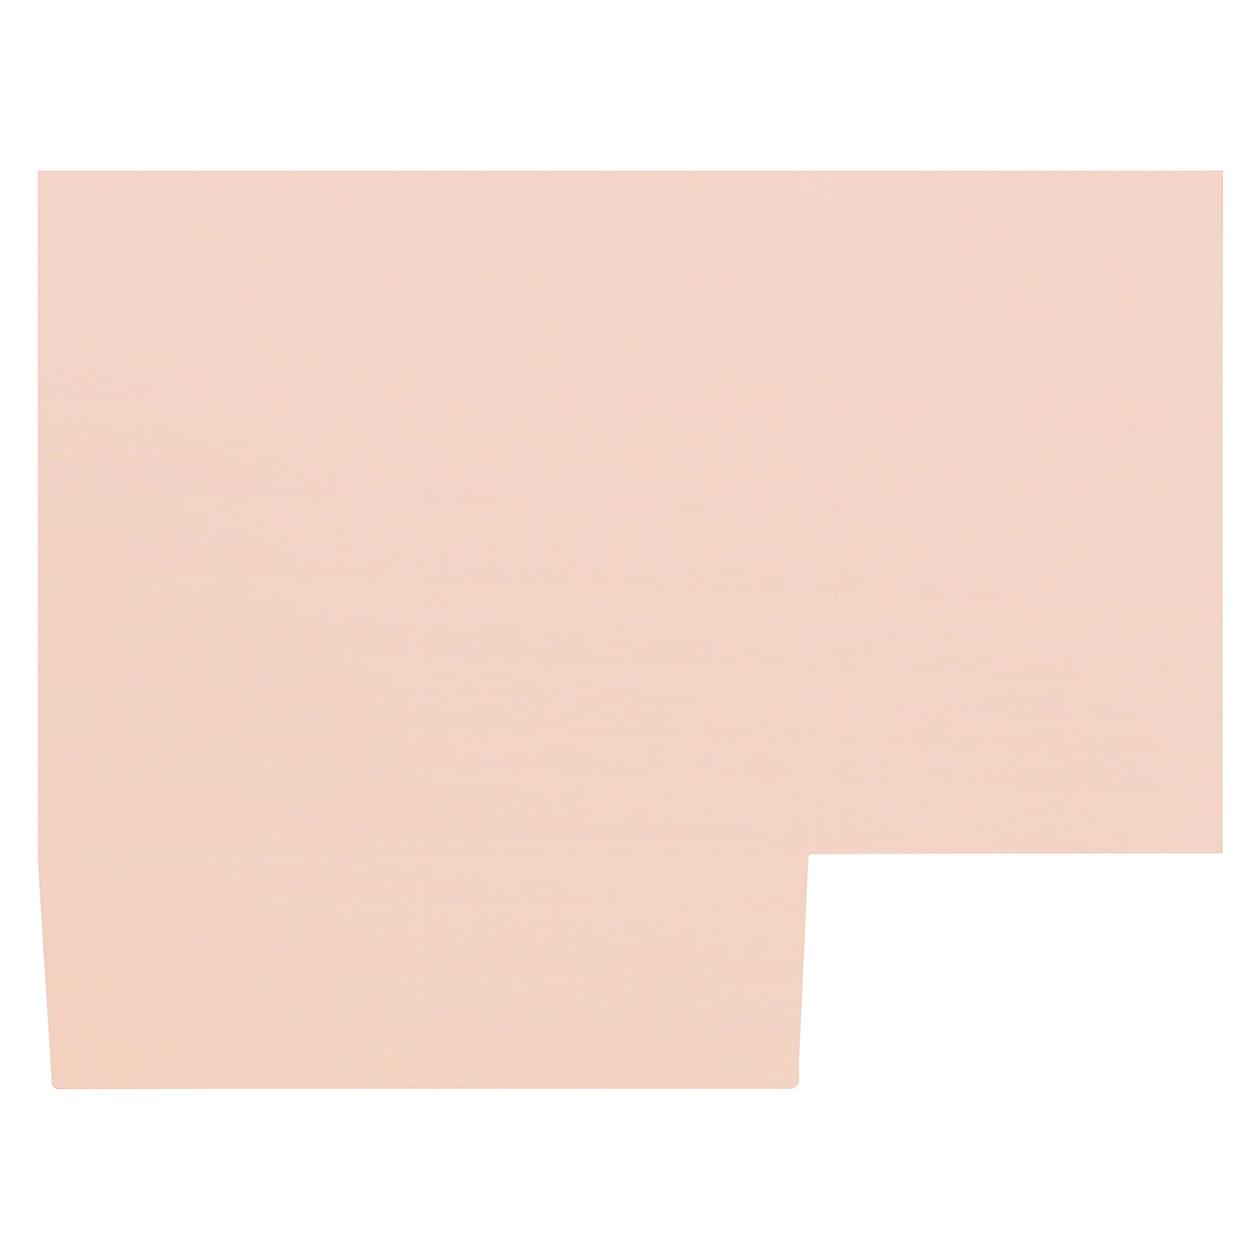 A31フォルダー Pale Pink 197.7g